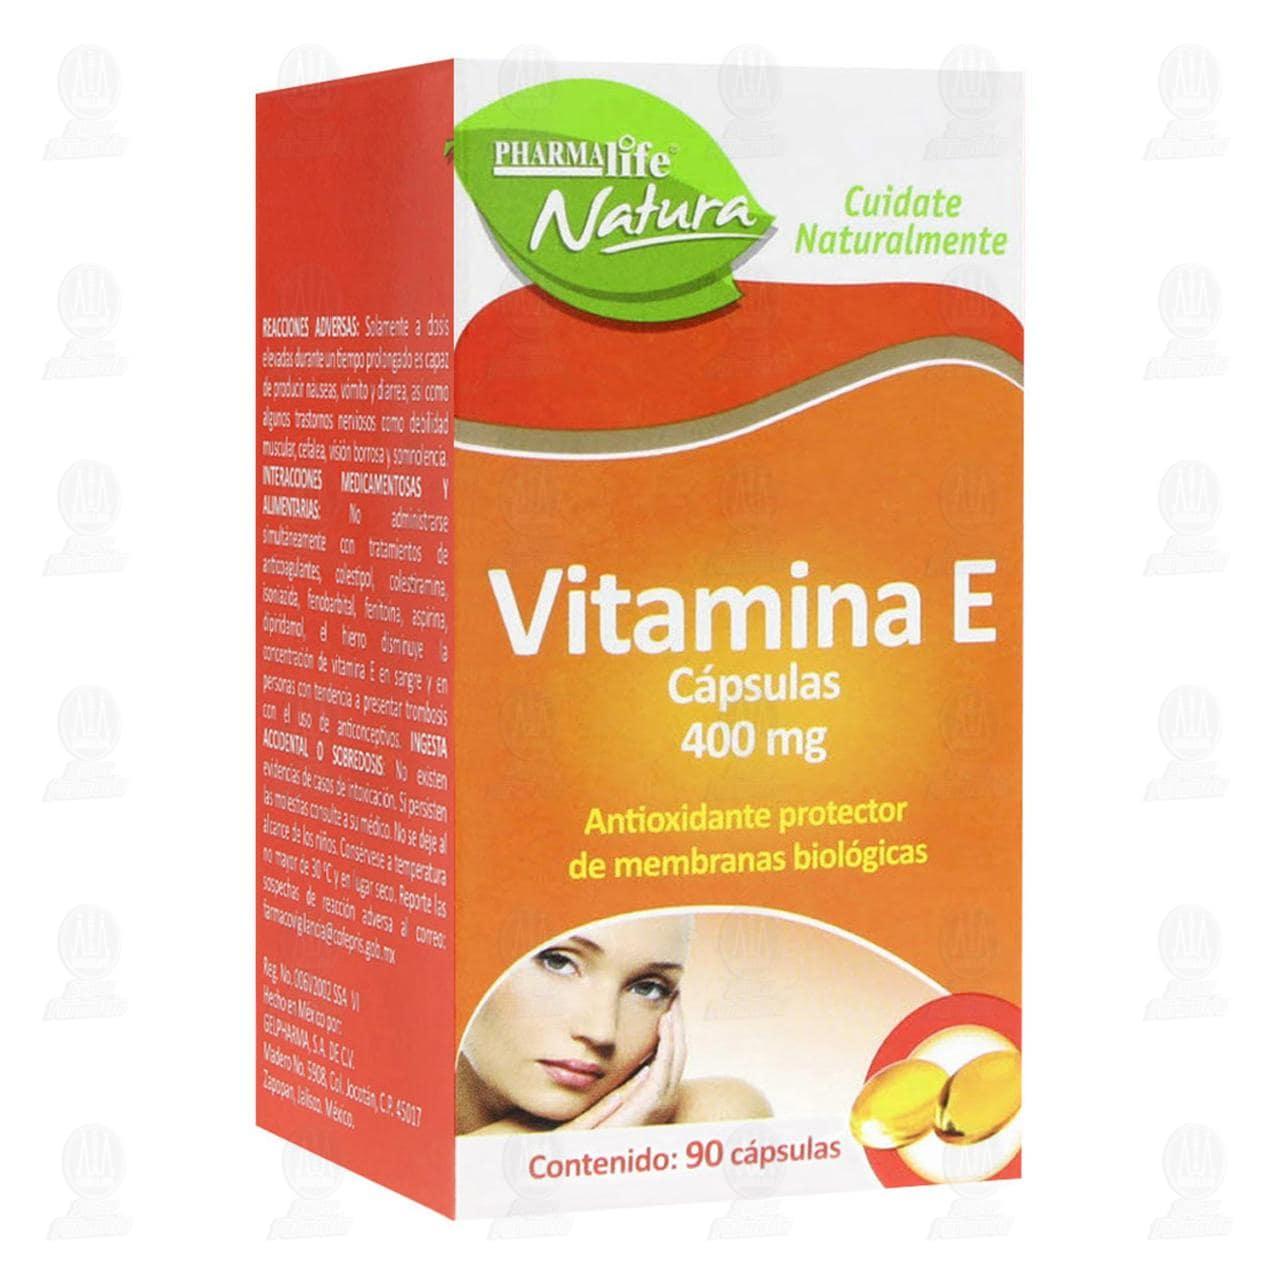 Comprar Vitamina E 400mg 90 Cápsulas Pharmalife Natura en Farmacias Guadalajara